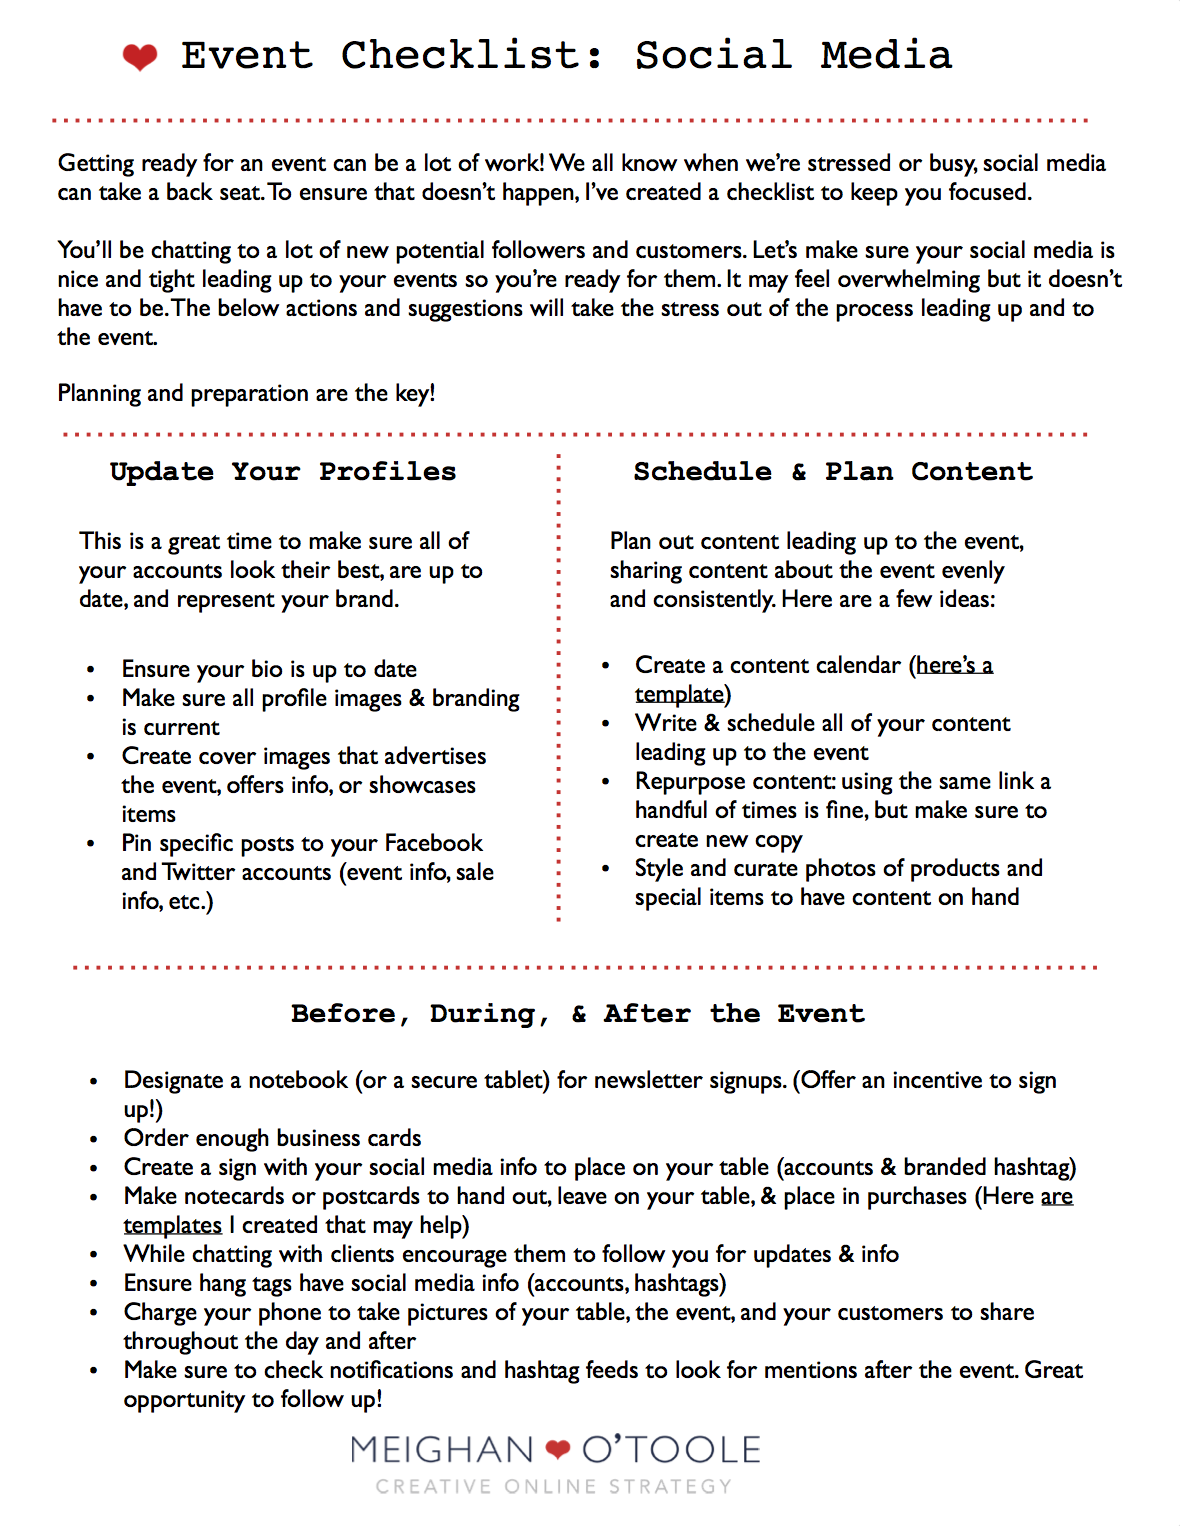 Free Printable Event Checklist For Social Media  Event Checklist